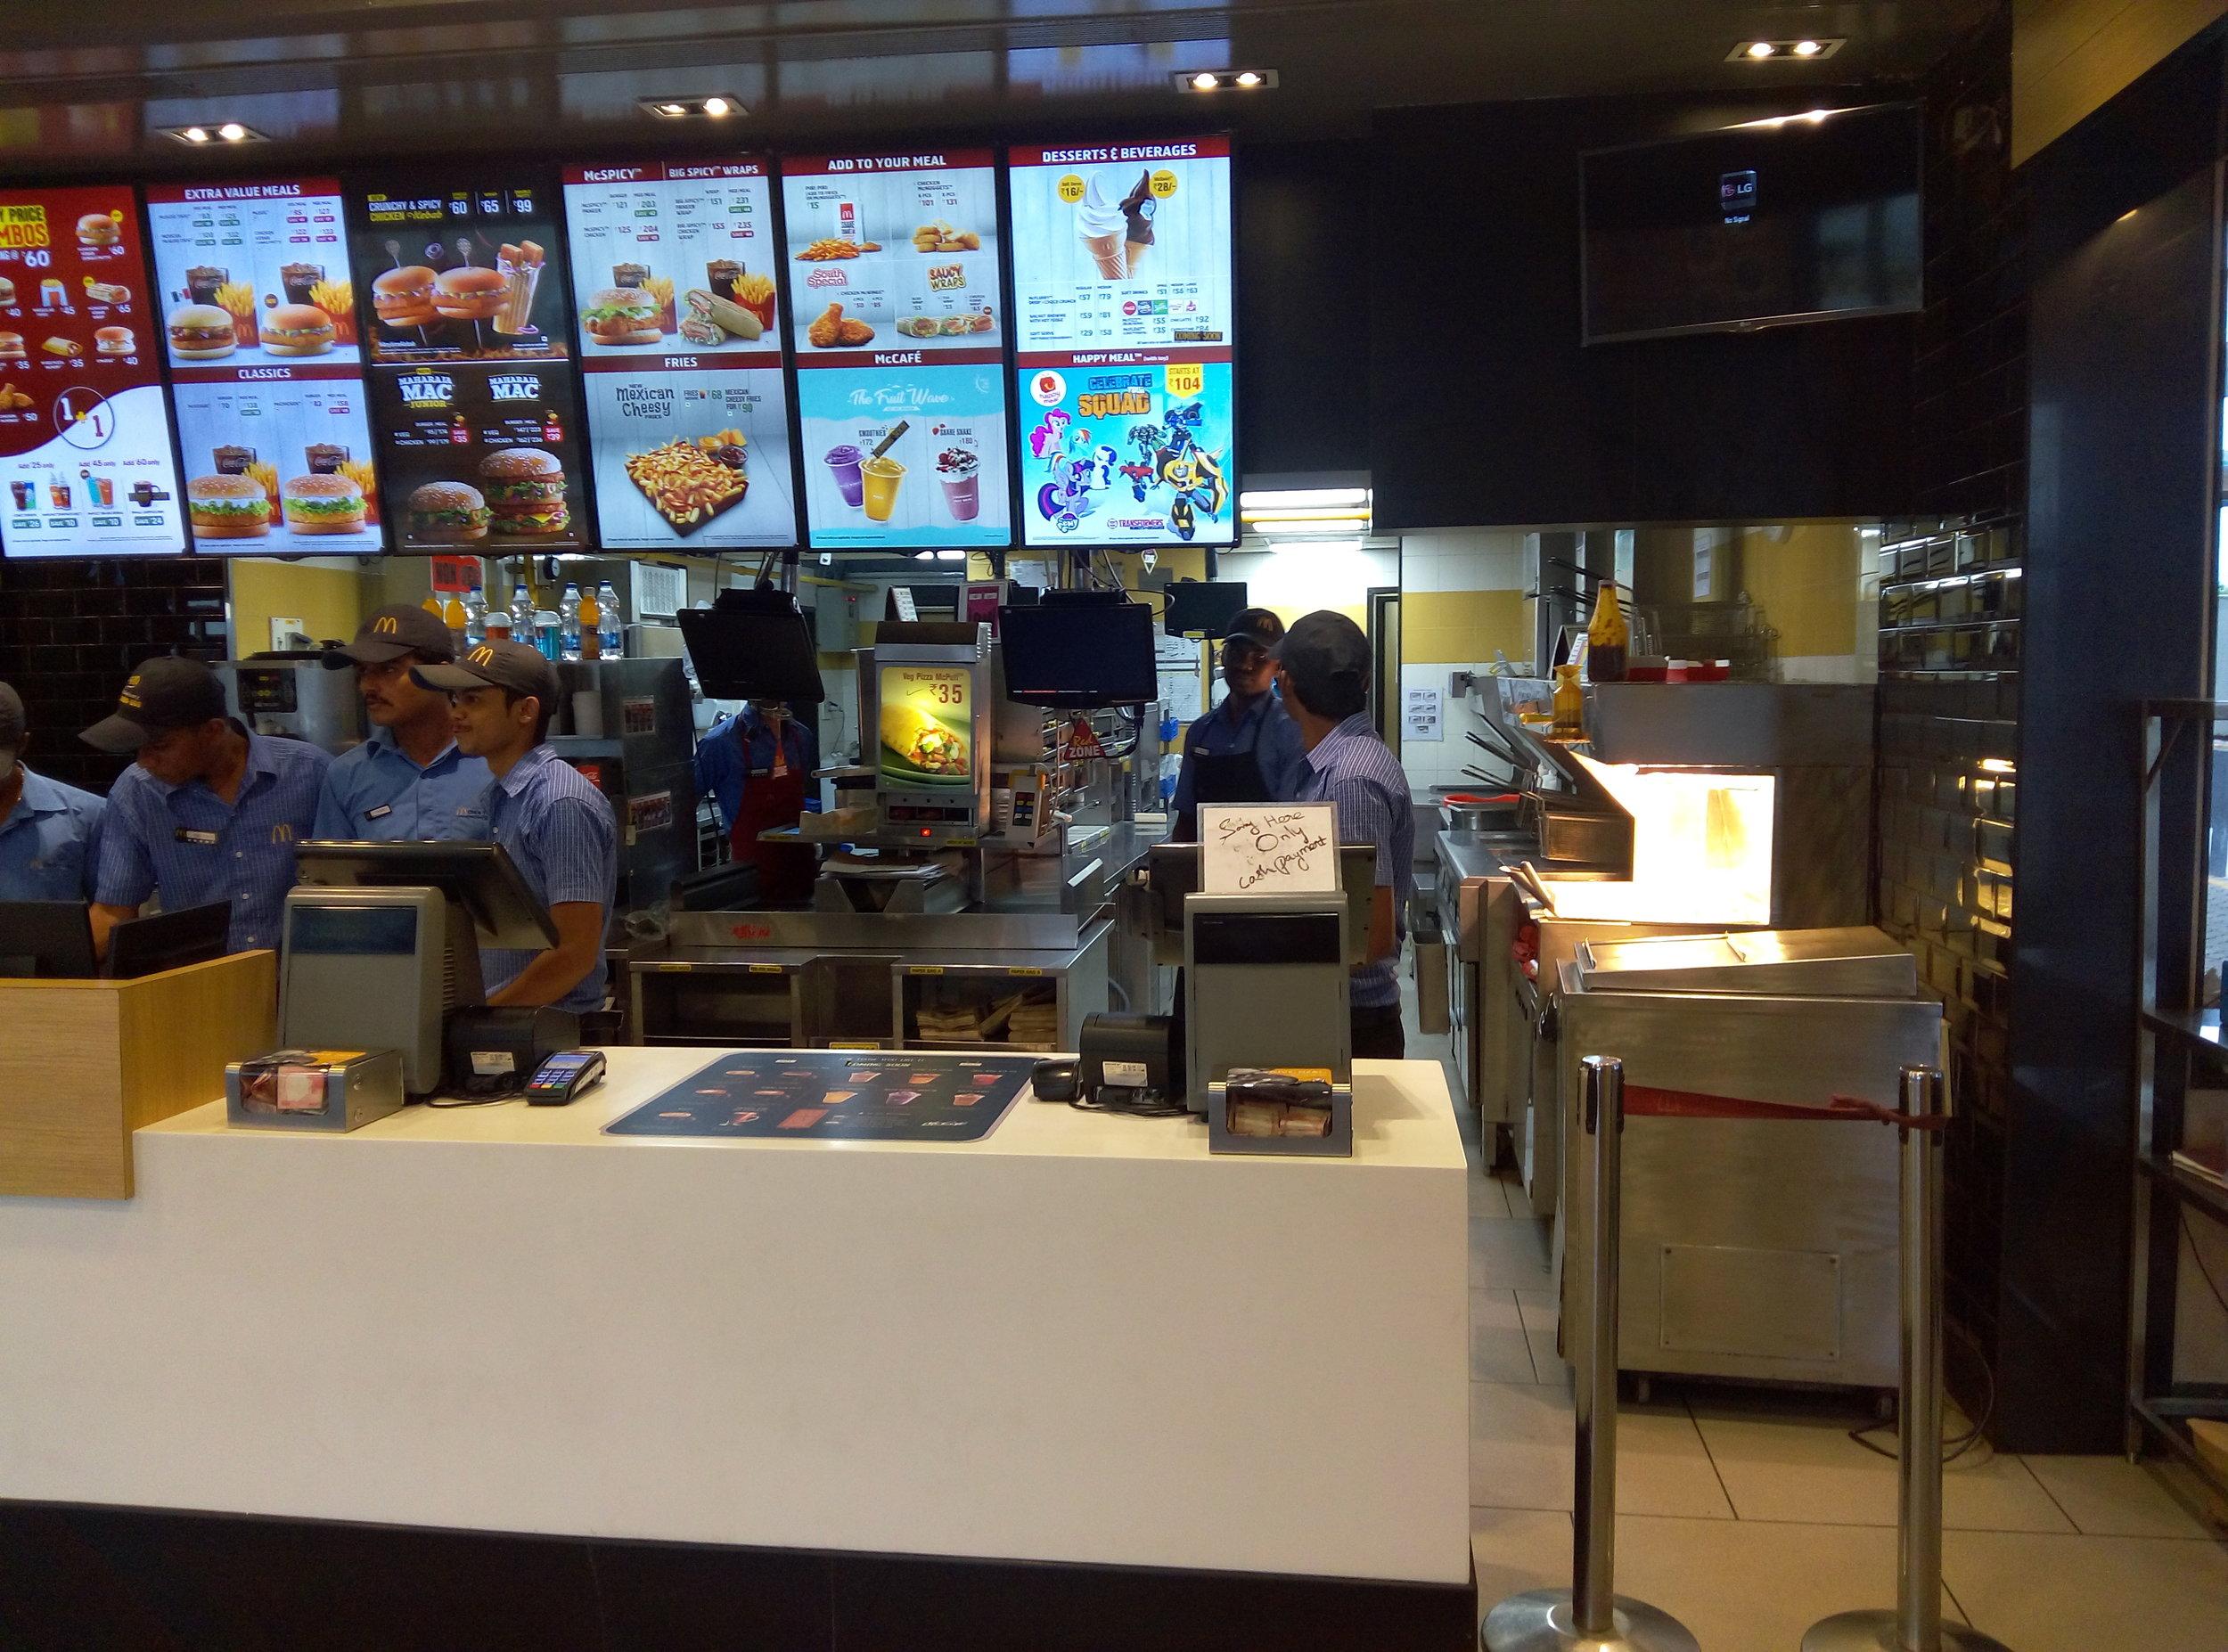 McDonalds India | Customer Service | Big Data | PritishSocial | Travel and Food Photo